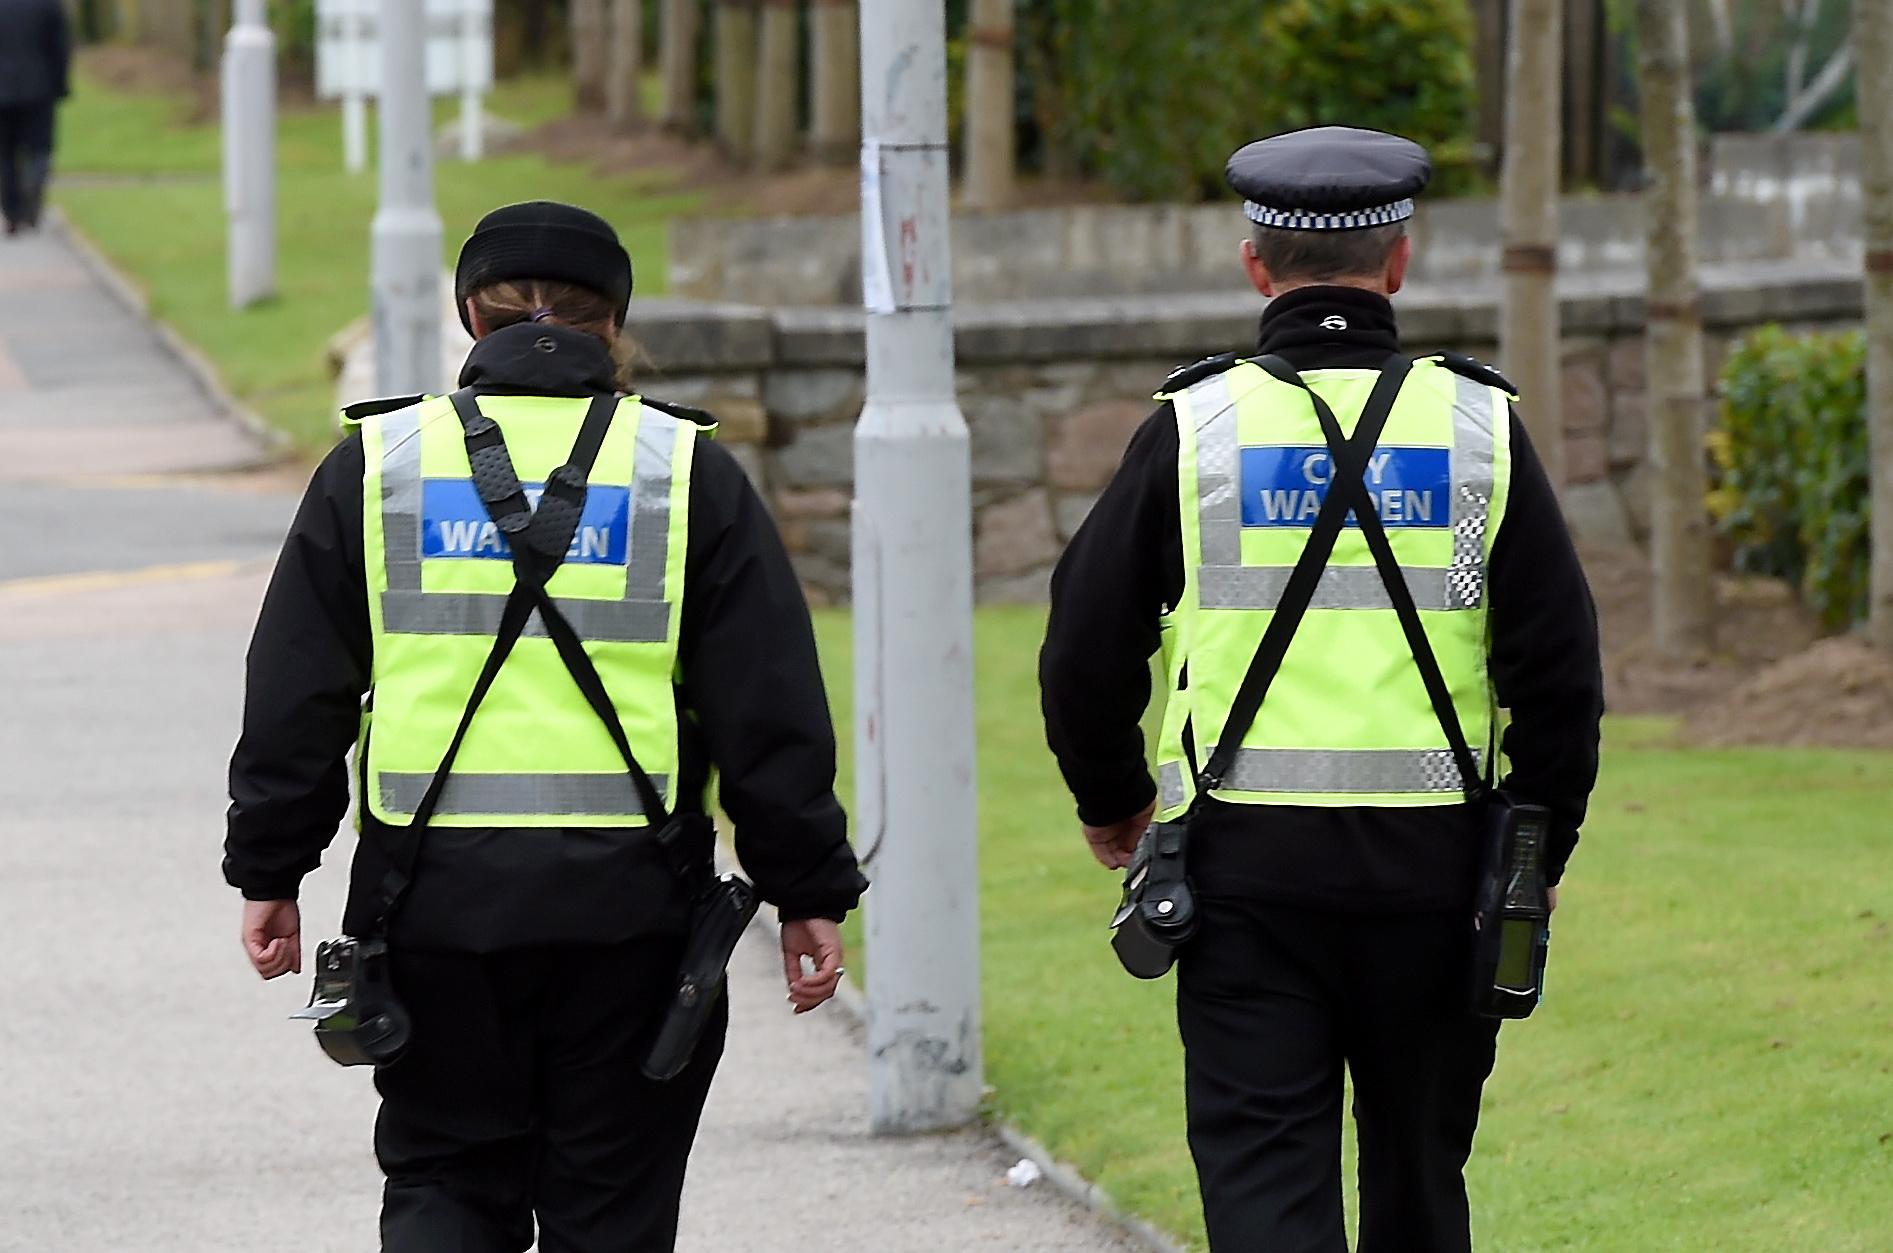 Unite is seeking legal advice over female wardens' hats.